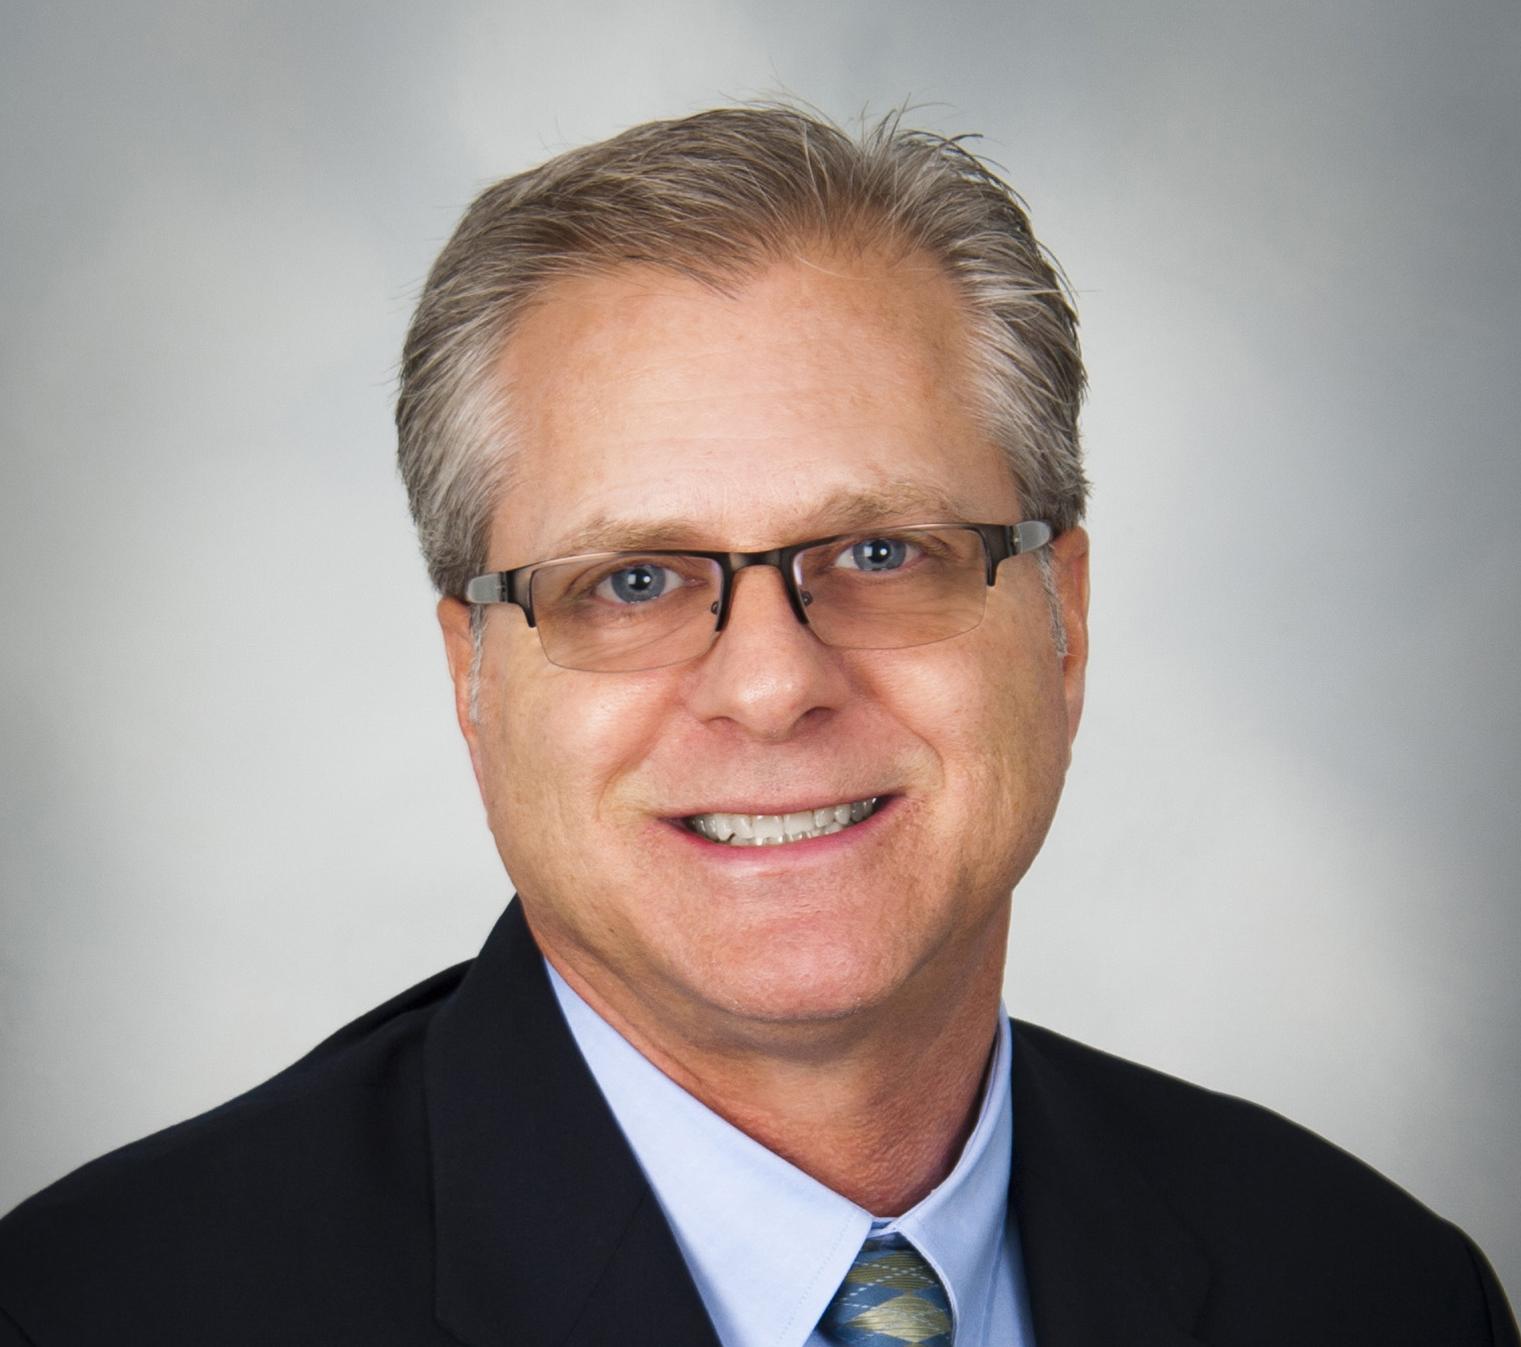 David A. Hemler, CFP®